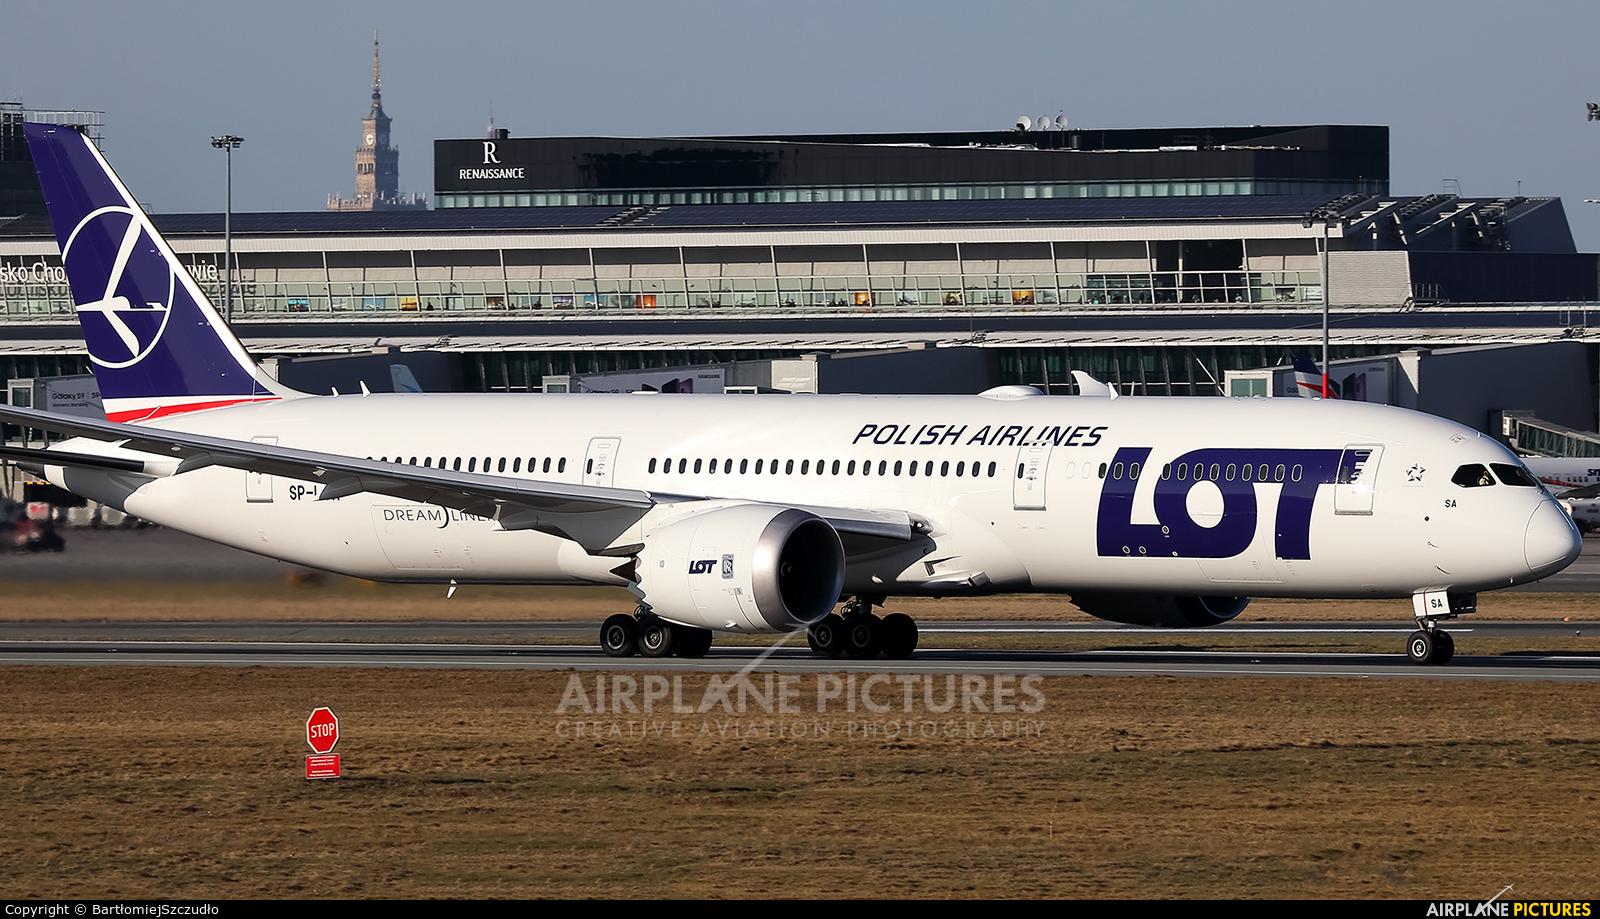 LOT - Polish Airlines SP-LSA aircraft at Warsaw - Frederic Chopin